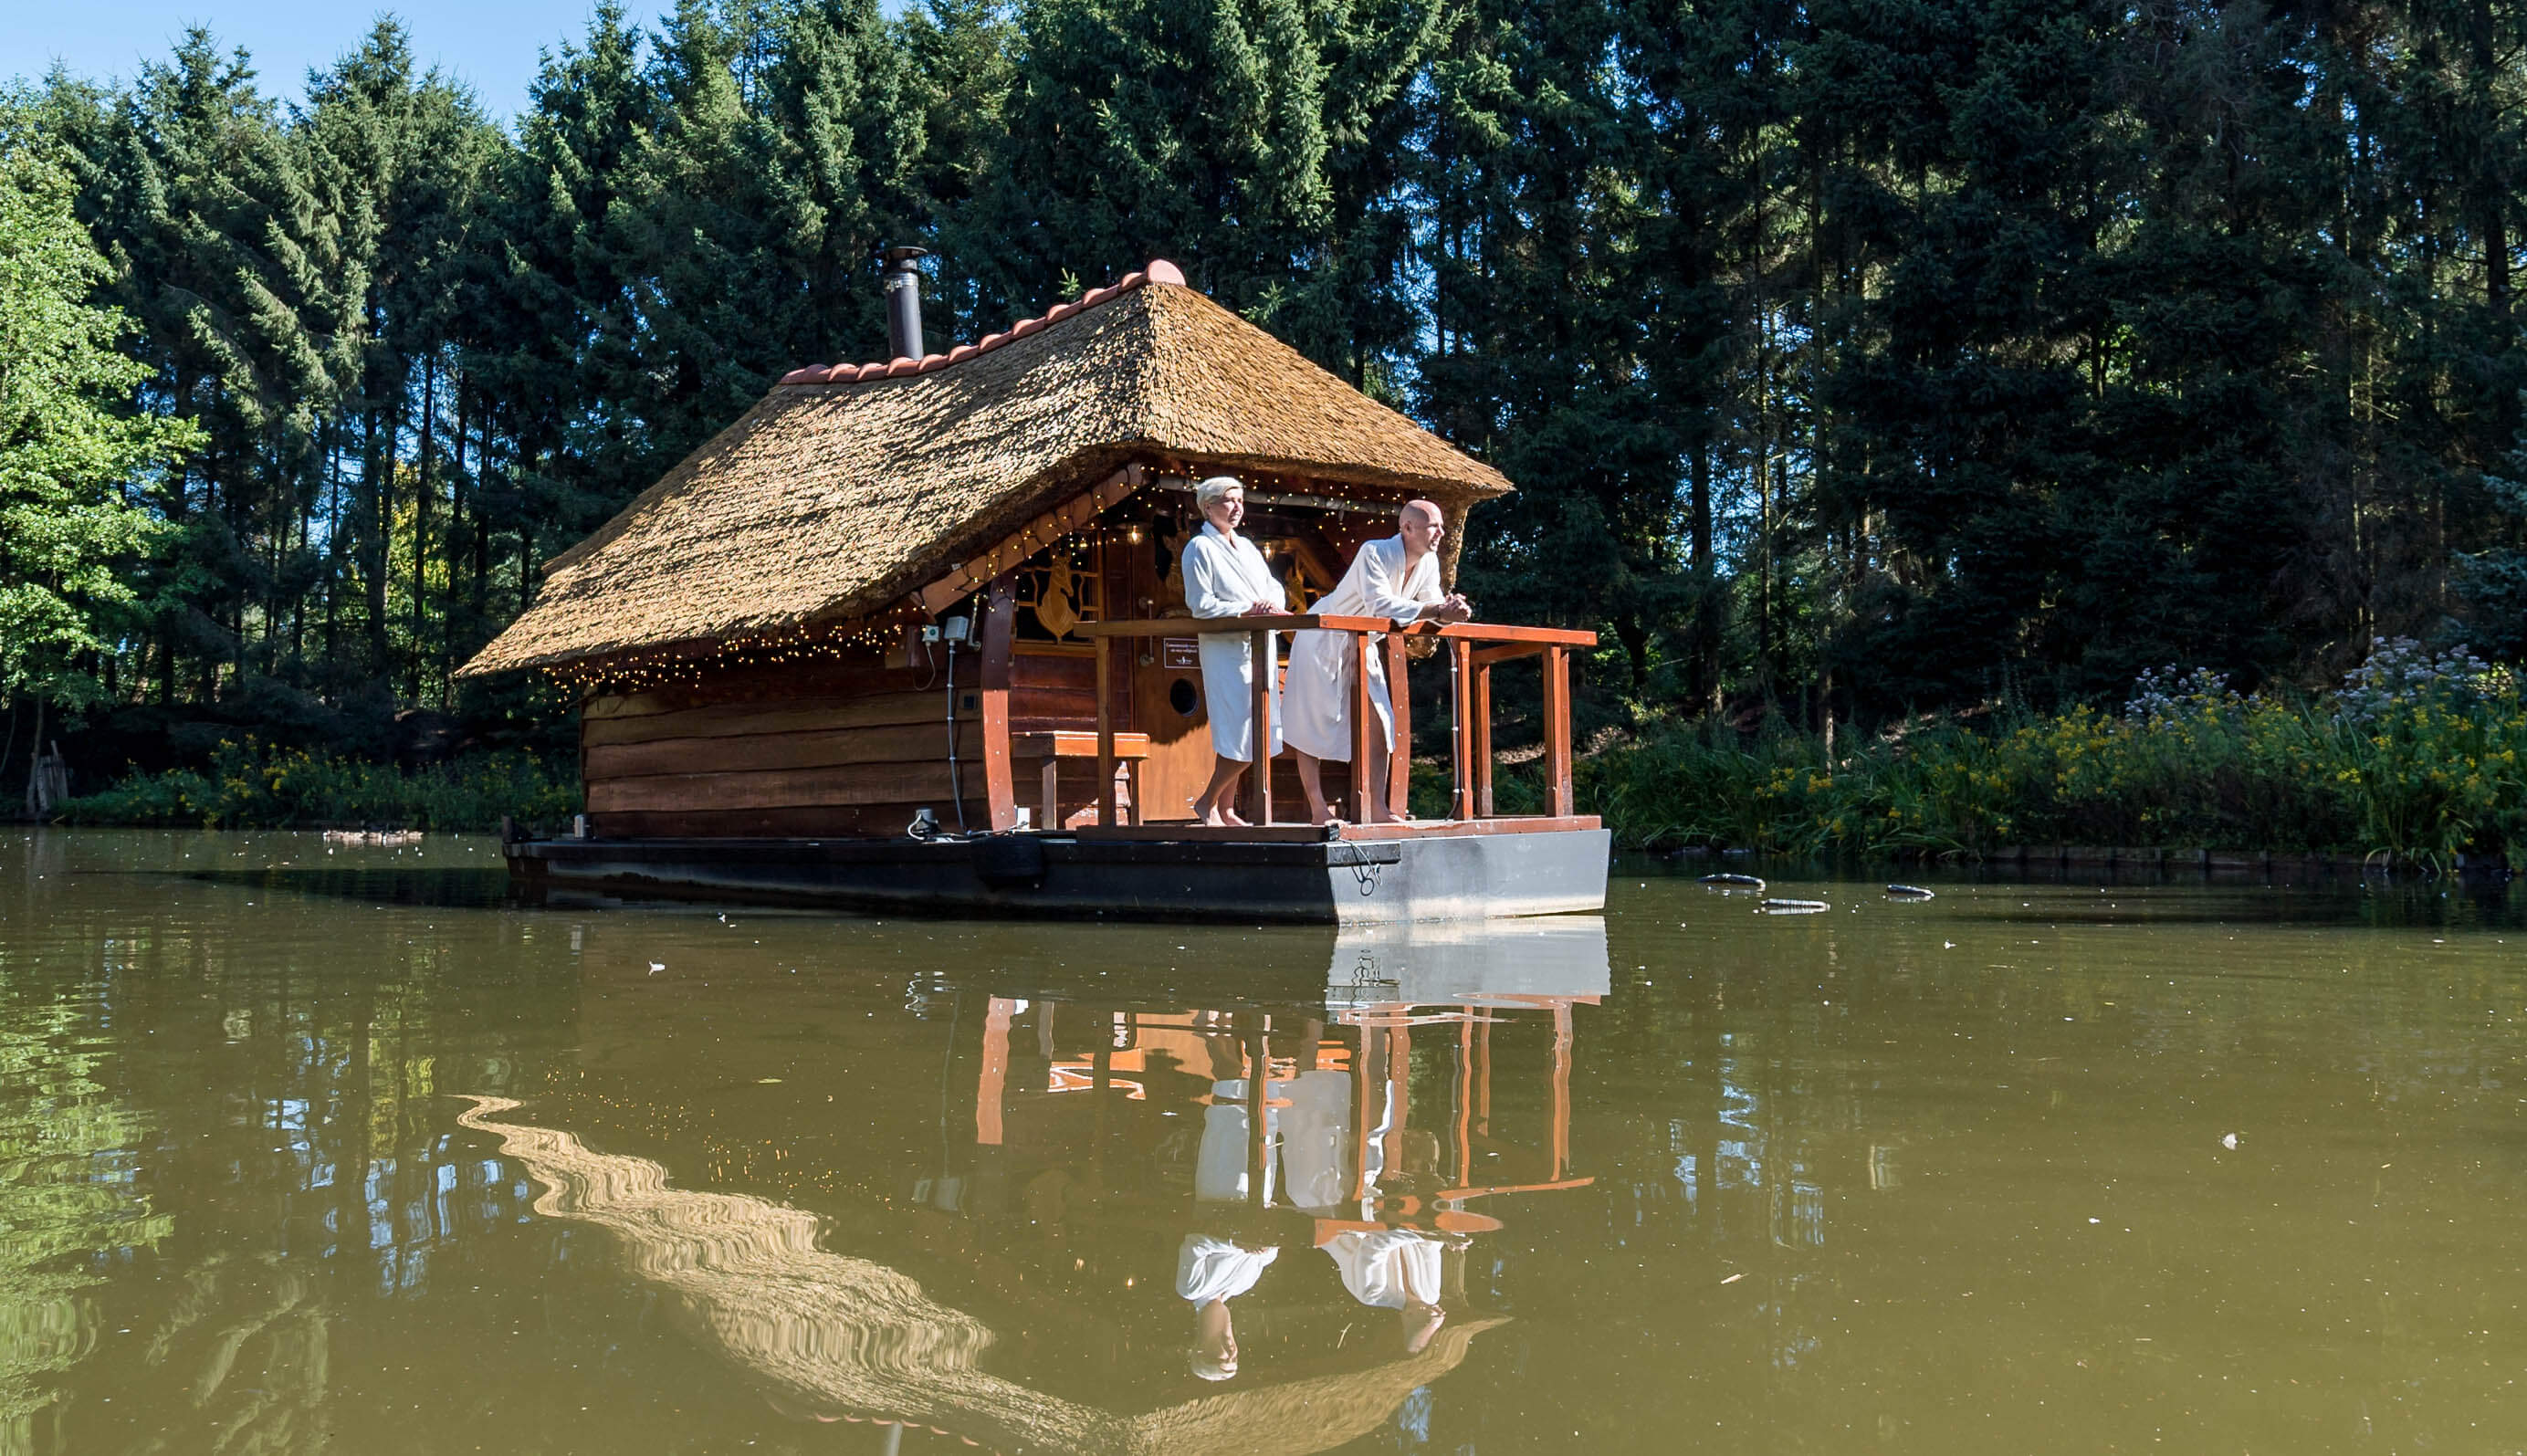 Sauna Drôme Putten aanbiedingen en korting